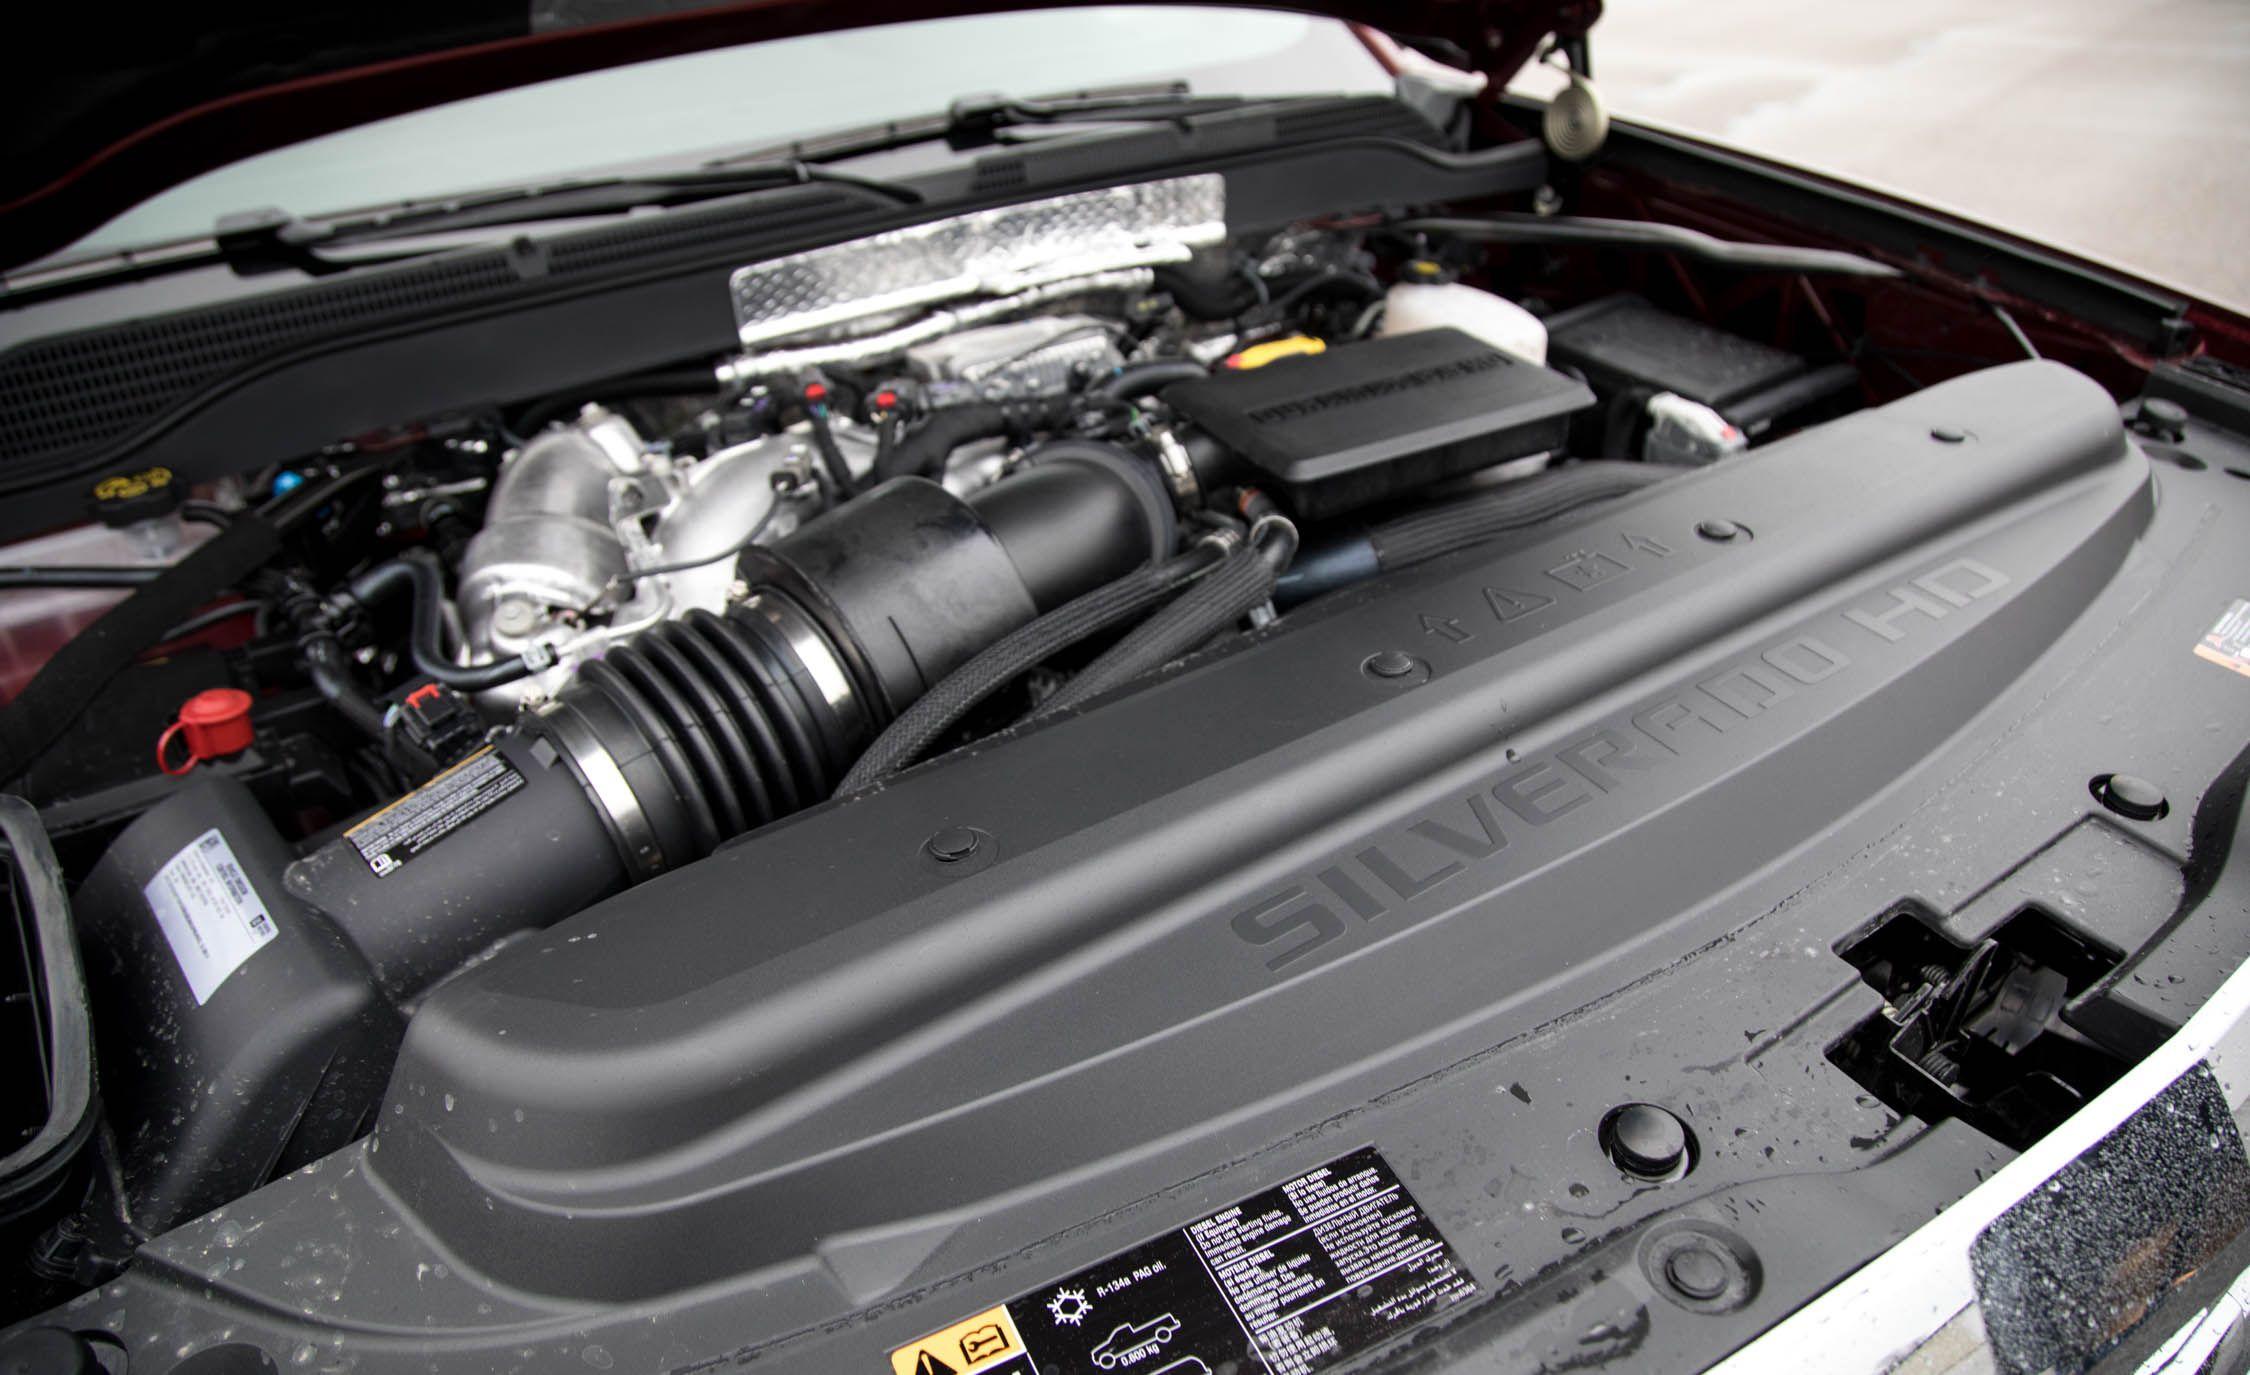 2020 Chevrolet Silverado 2500hd 3500hd Reviews Chevrolet